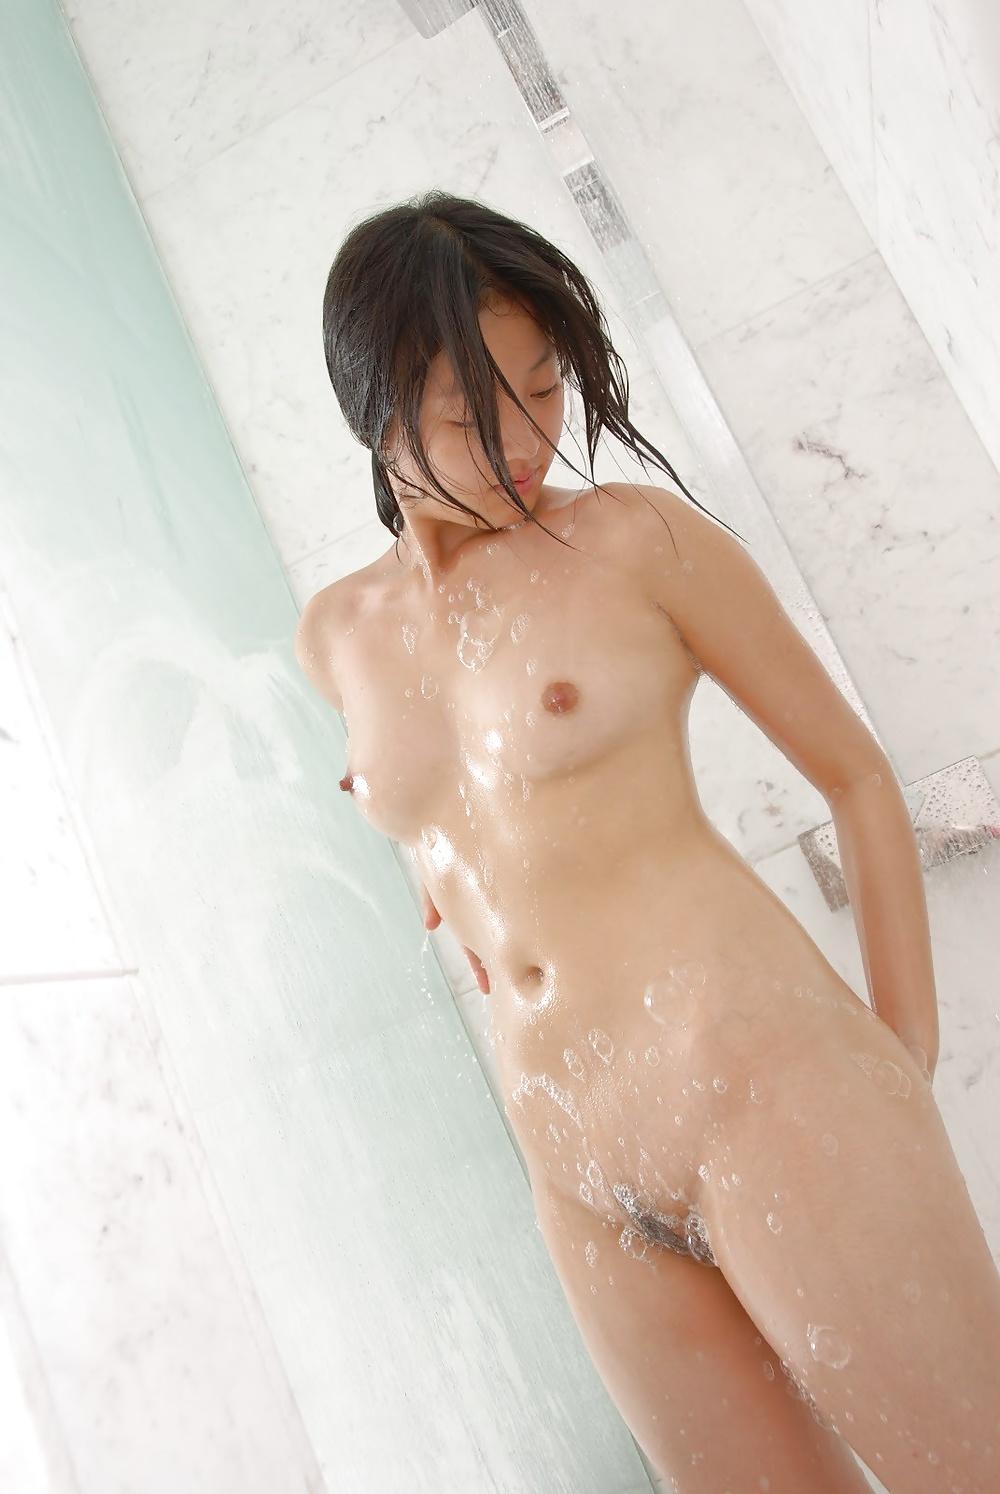 Hot Japan Japan Shower Category Nude Japan Babes